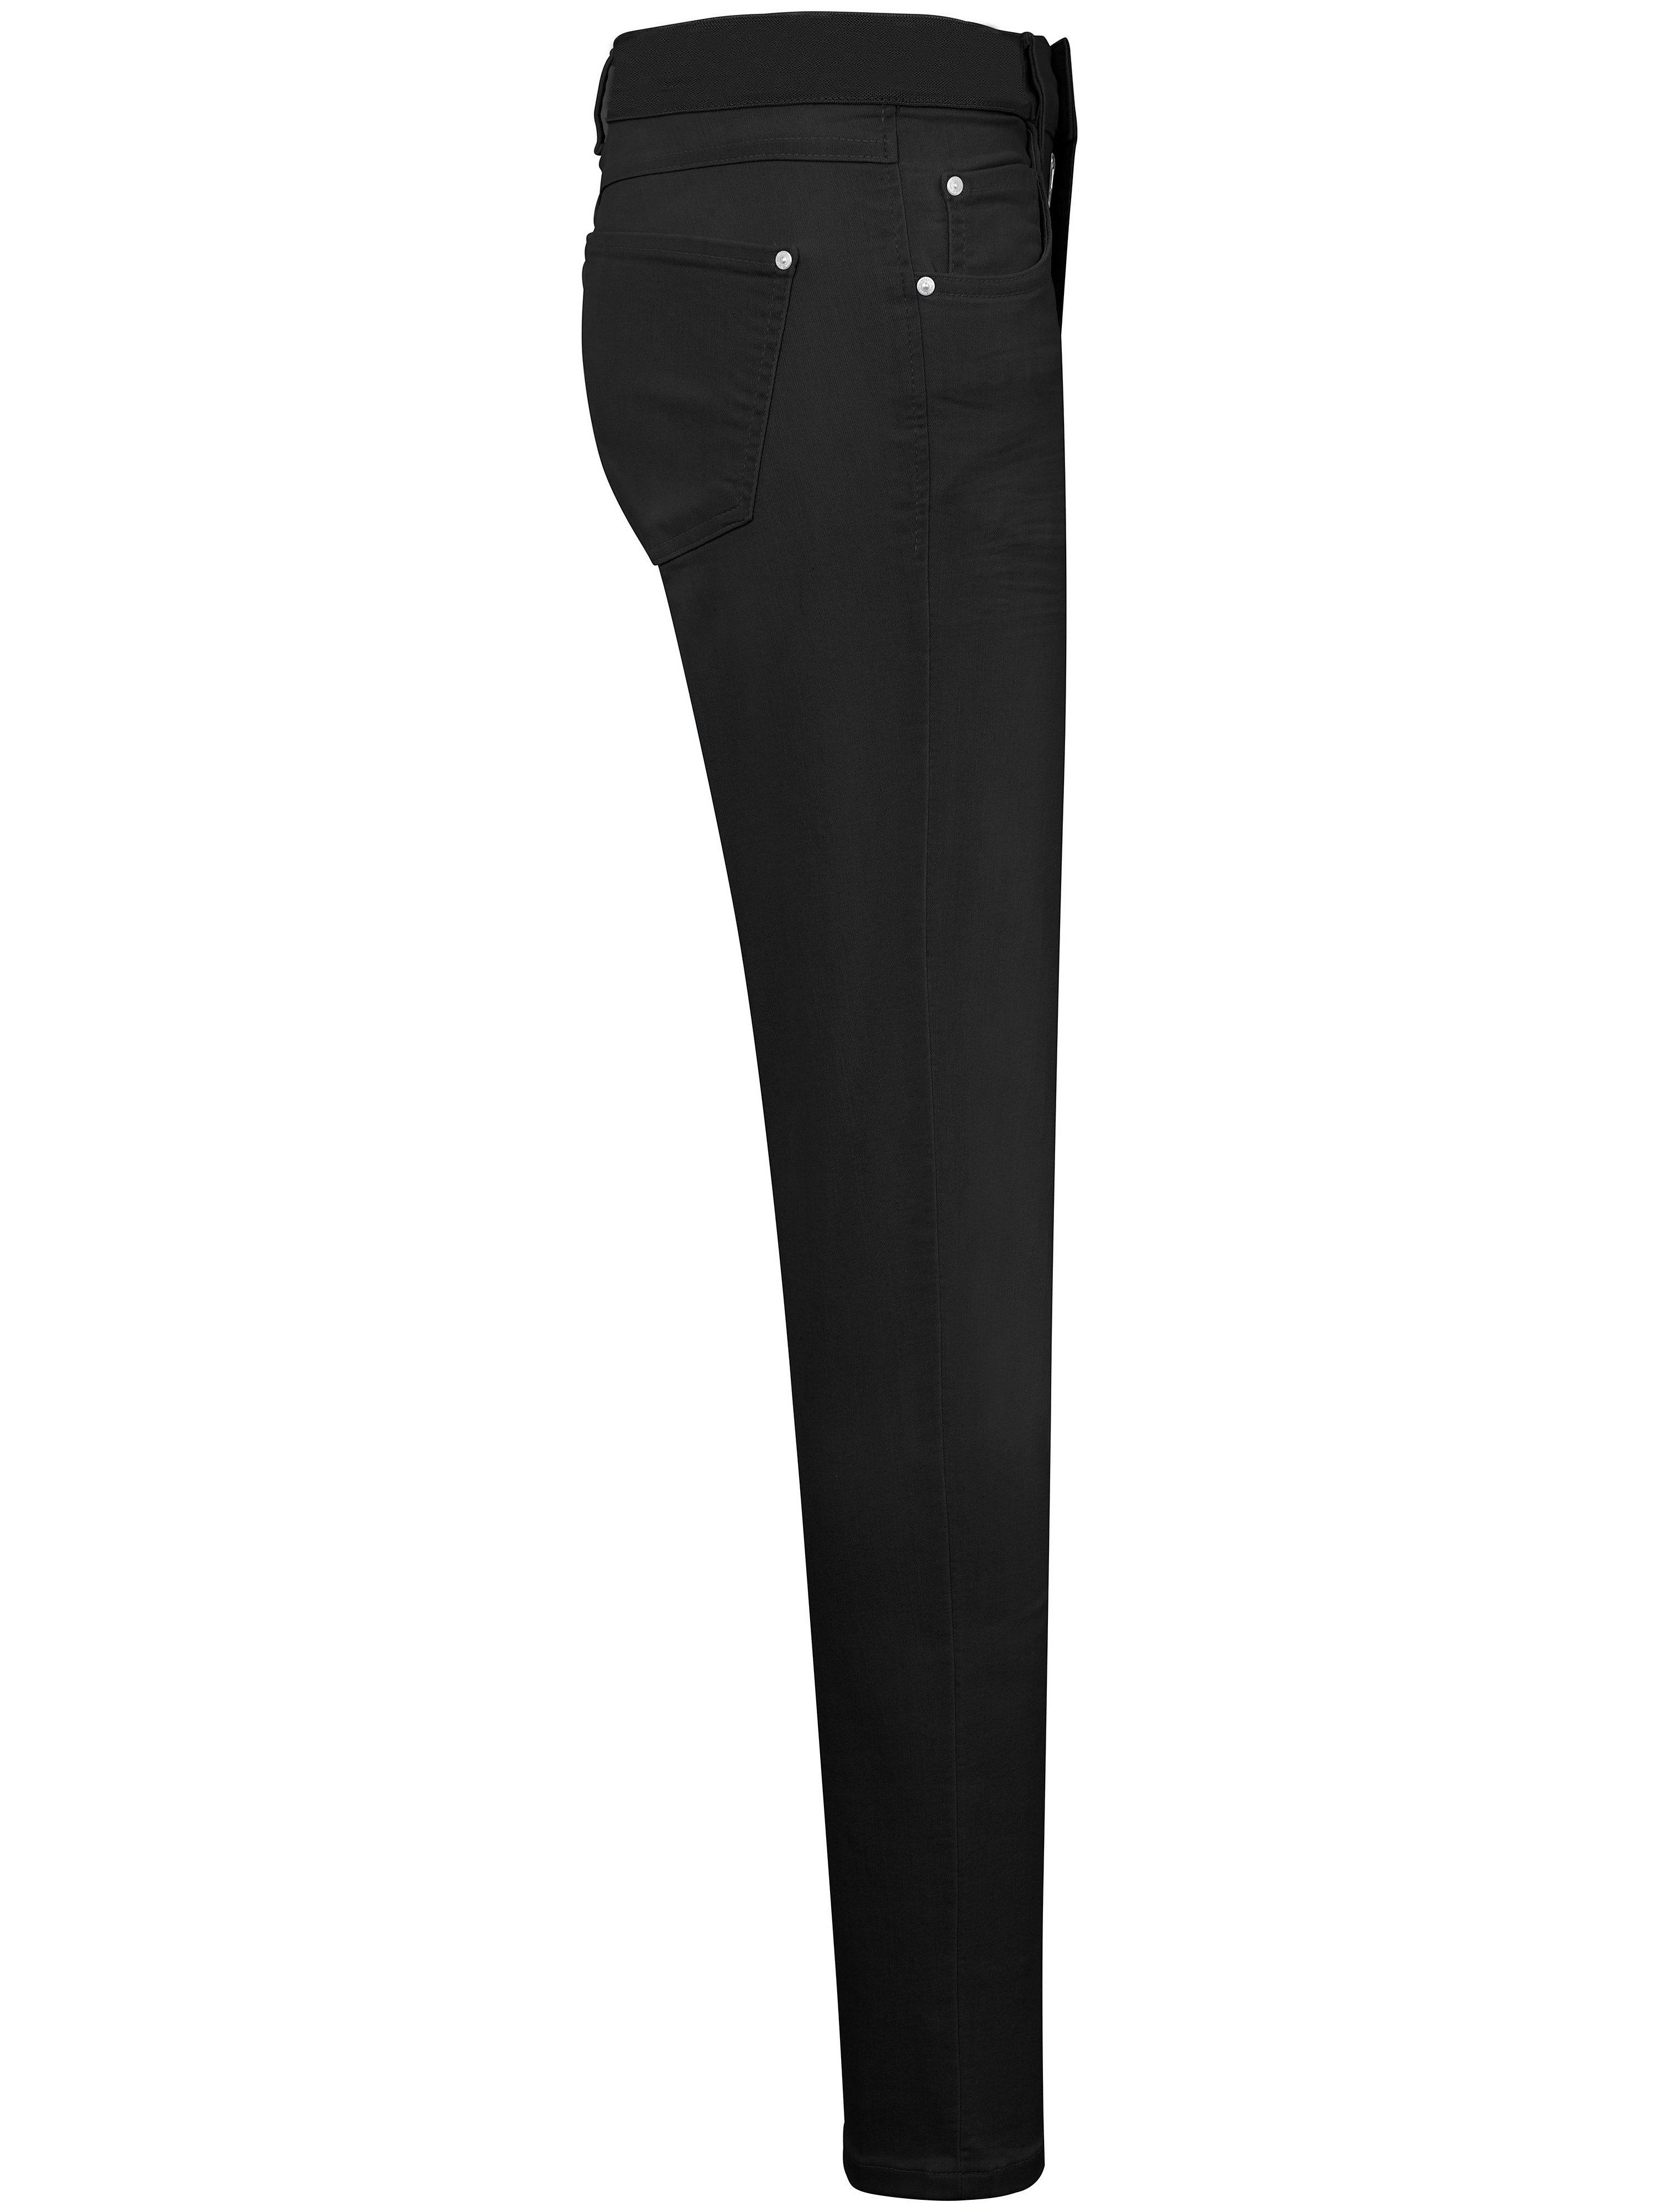 One size fits all-jeans 5 lommer Fra ANGELS denim